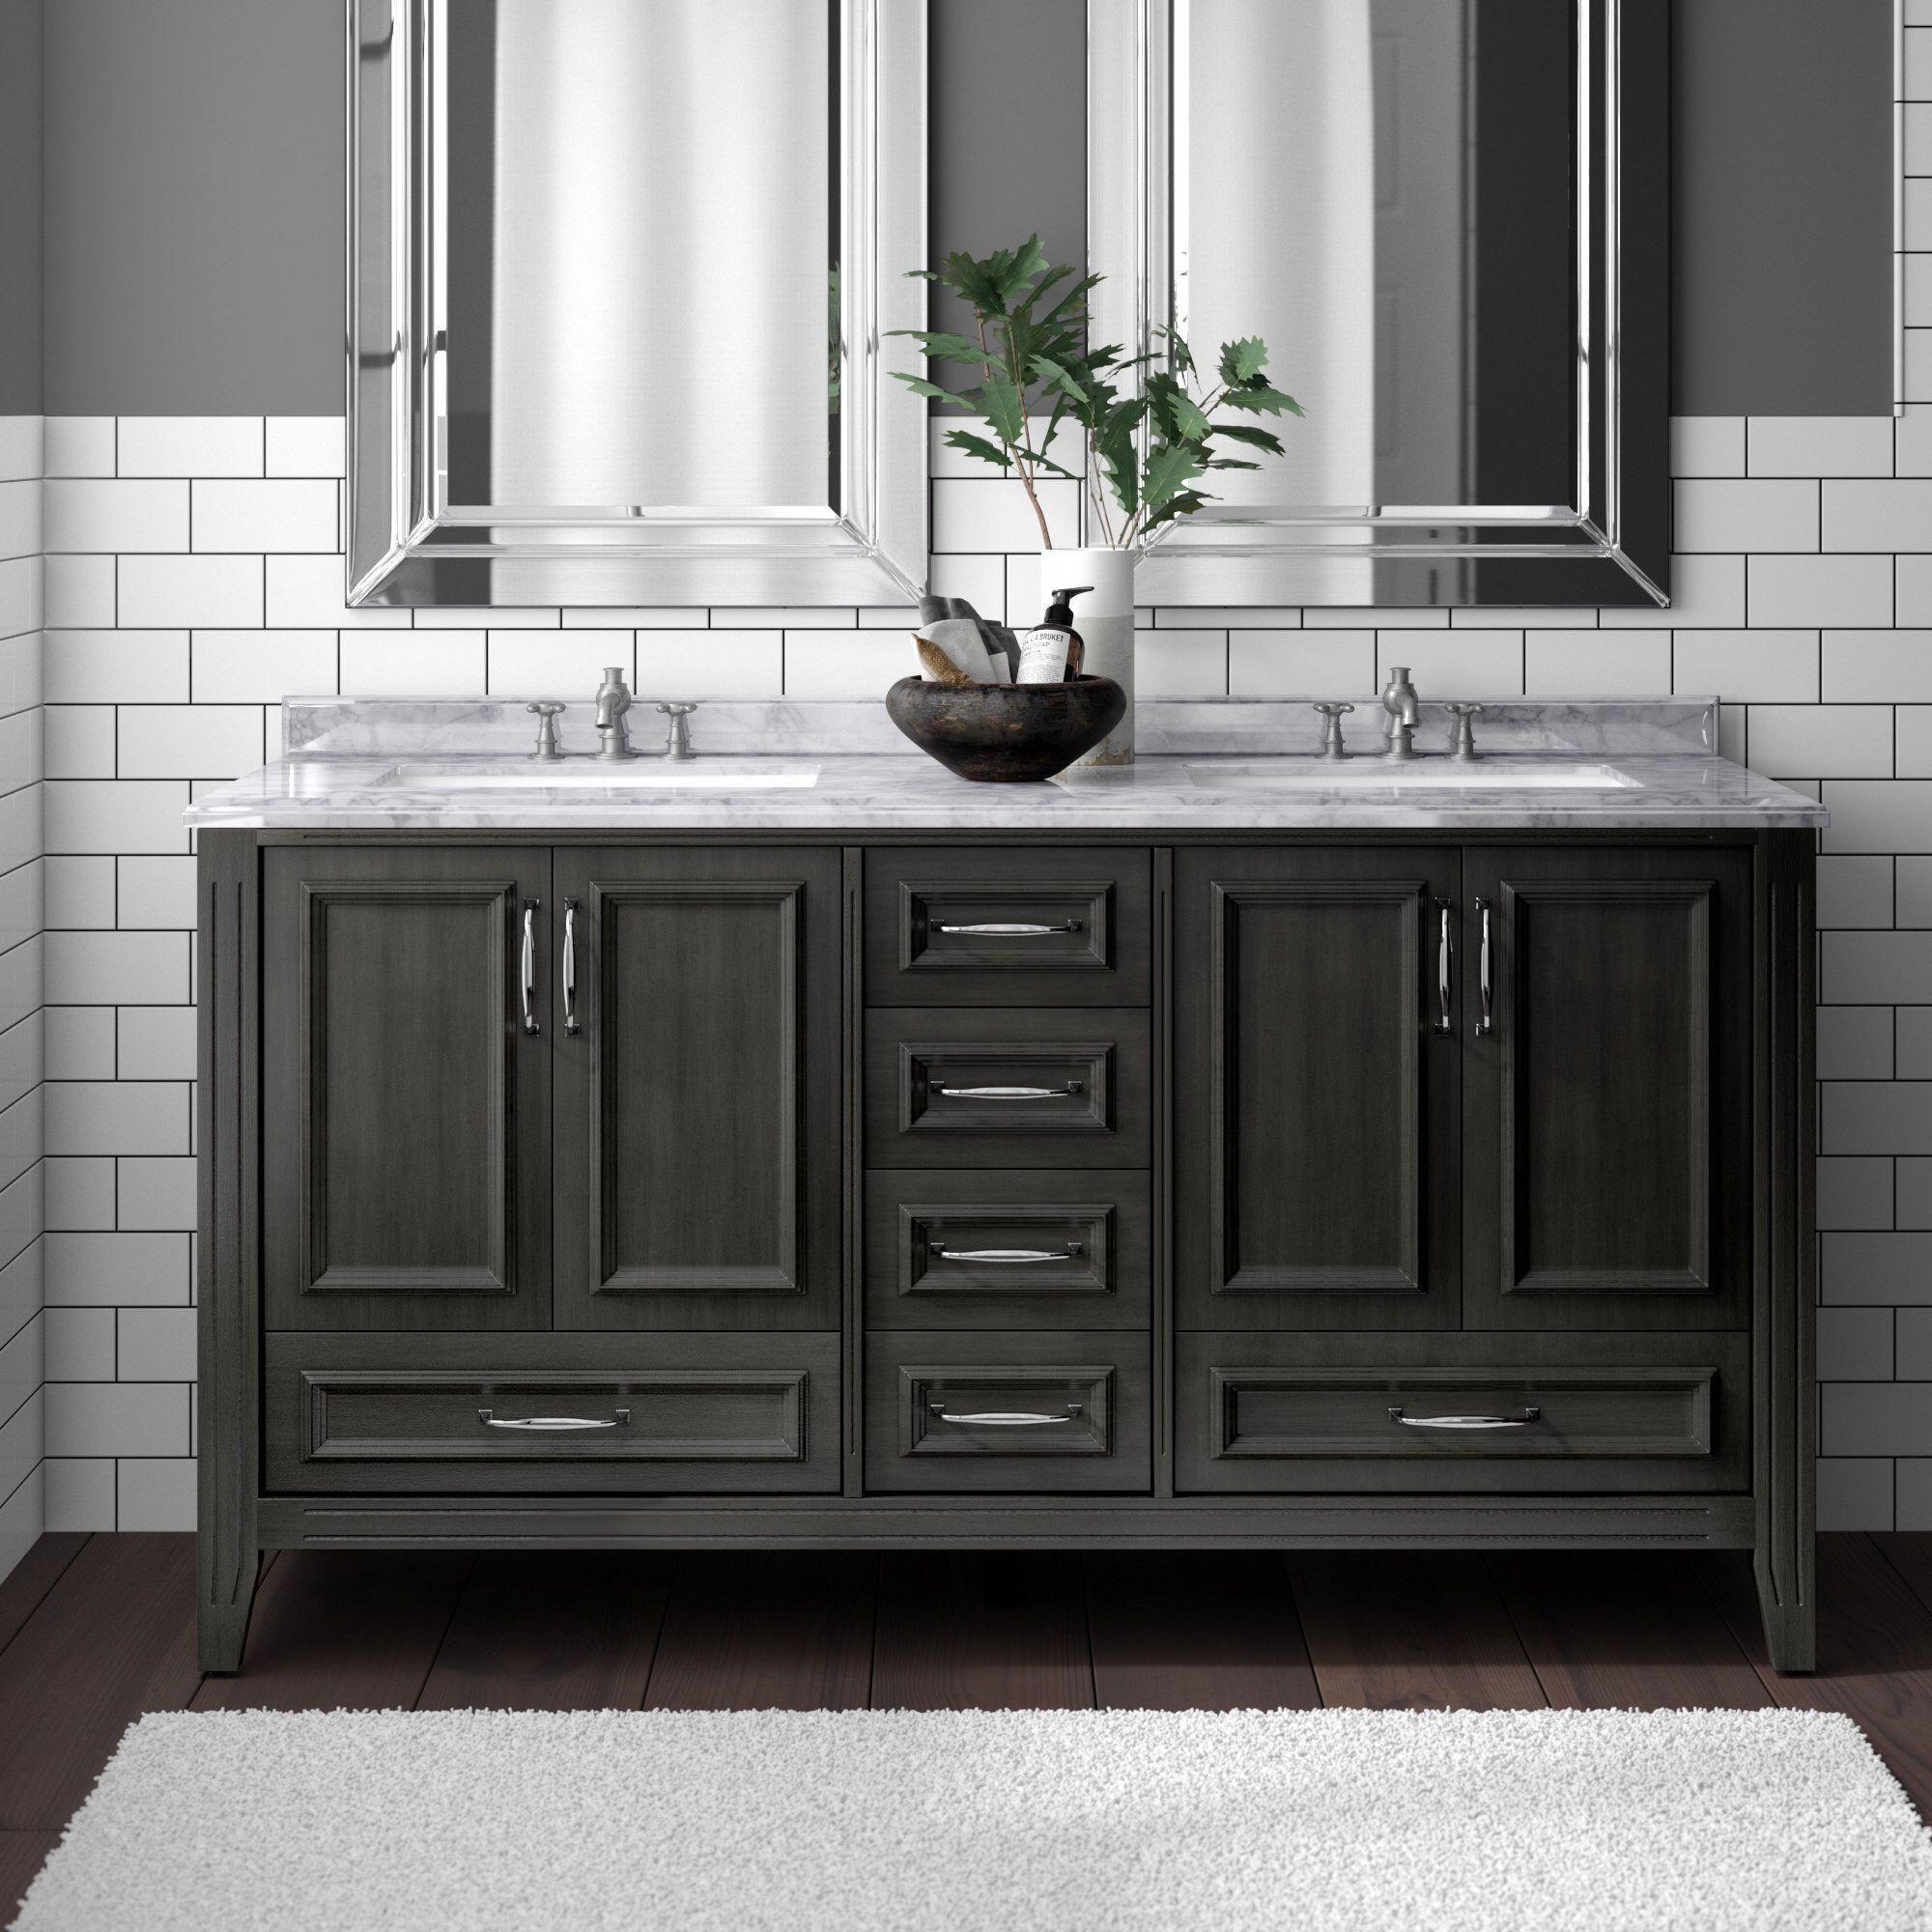 Schulenburg 60 Double Bathroom Vanity Set Bathroommakeovers With Images Double Vanity Bathroom Bathroom Vanity Double Vanity